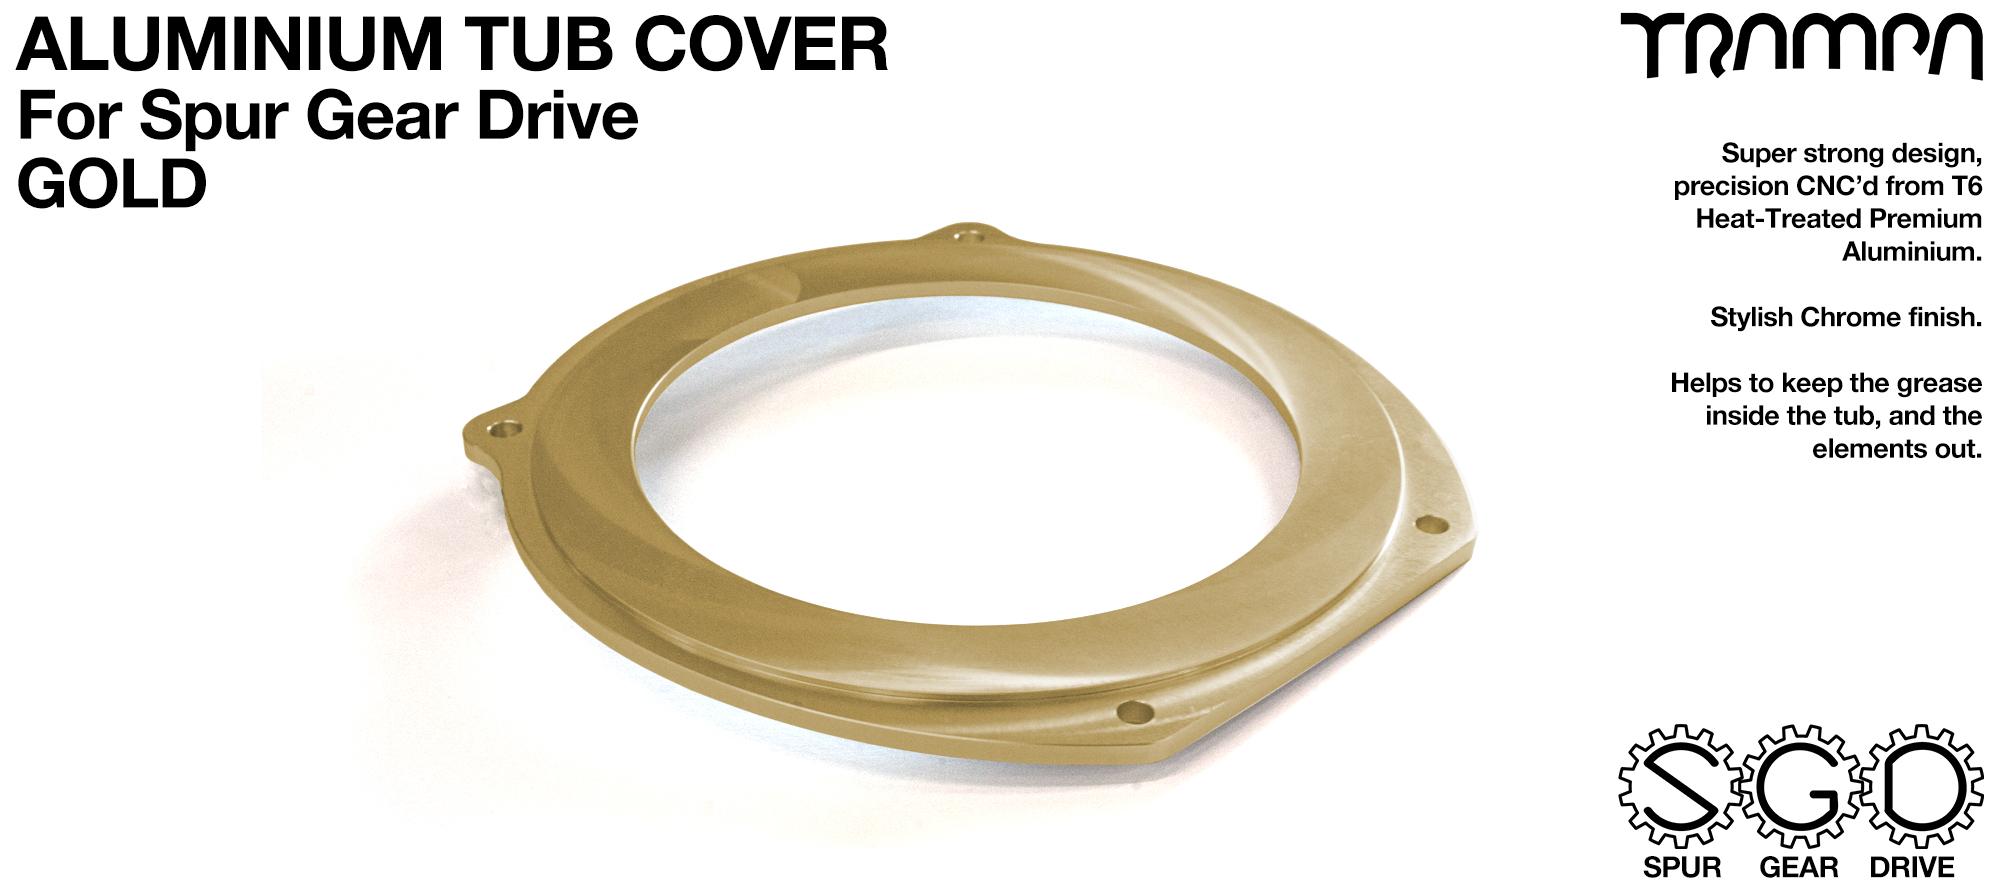 TRAMPA MKII Spur Gear Drive T6 Aluminium Tub Cover - GOLD